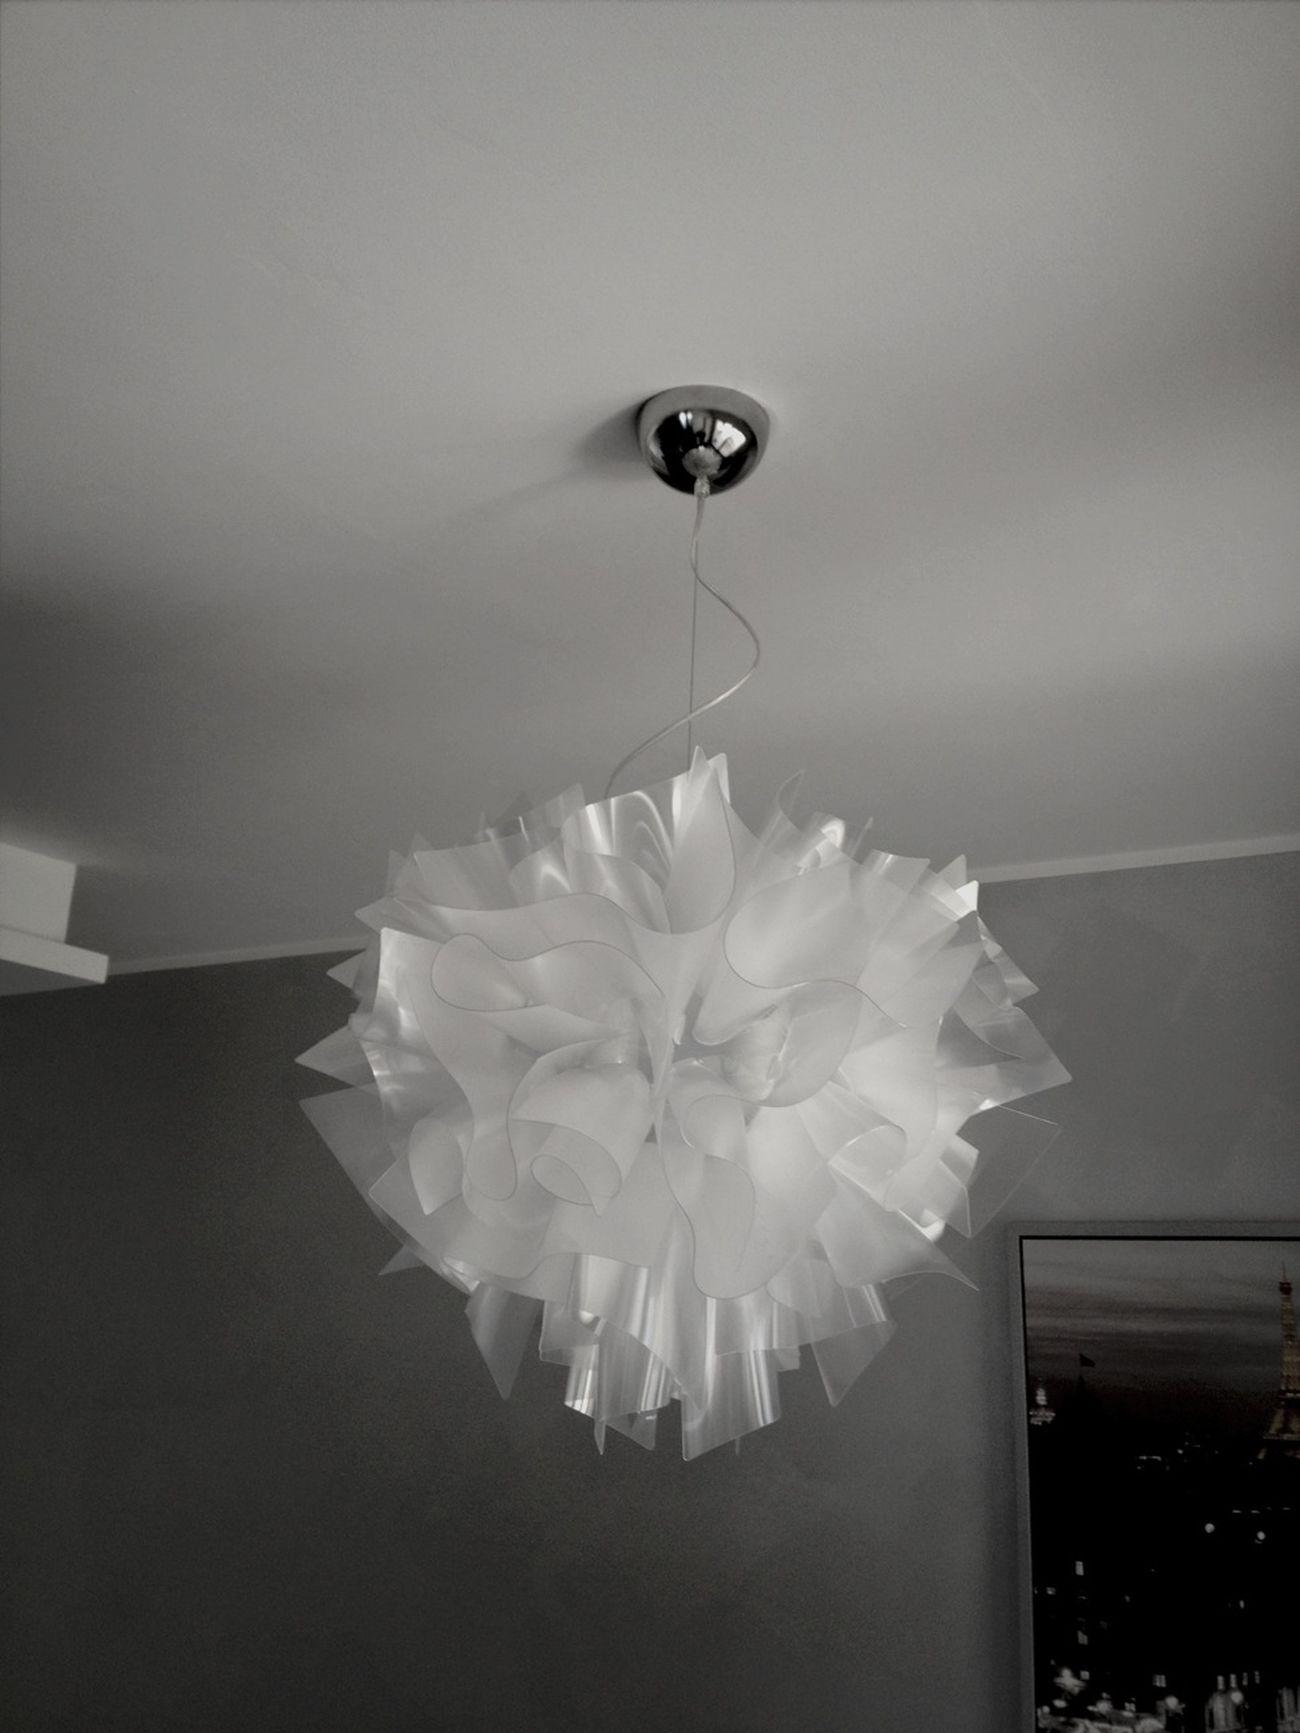 Intimate Light Source